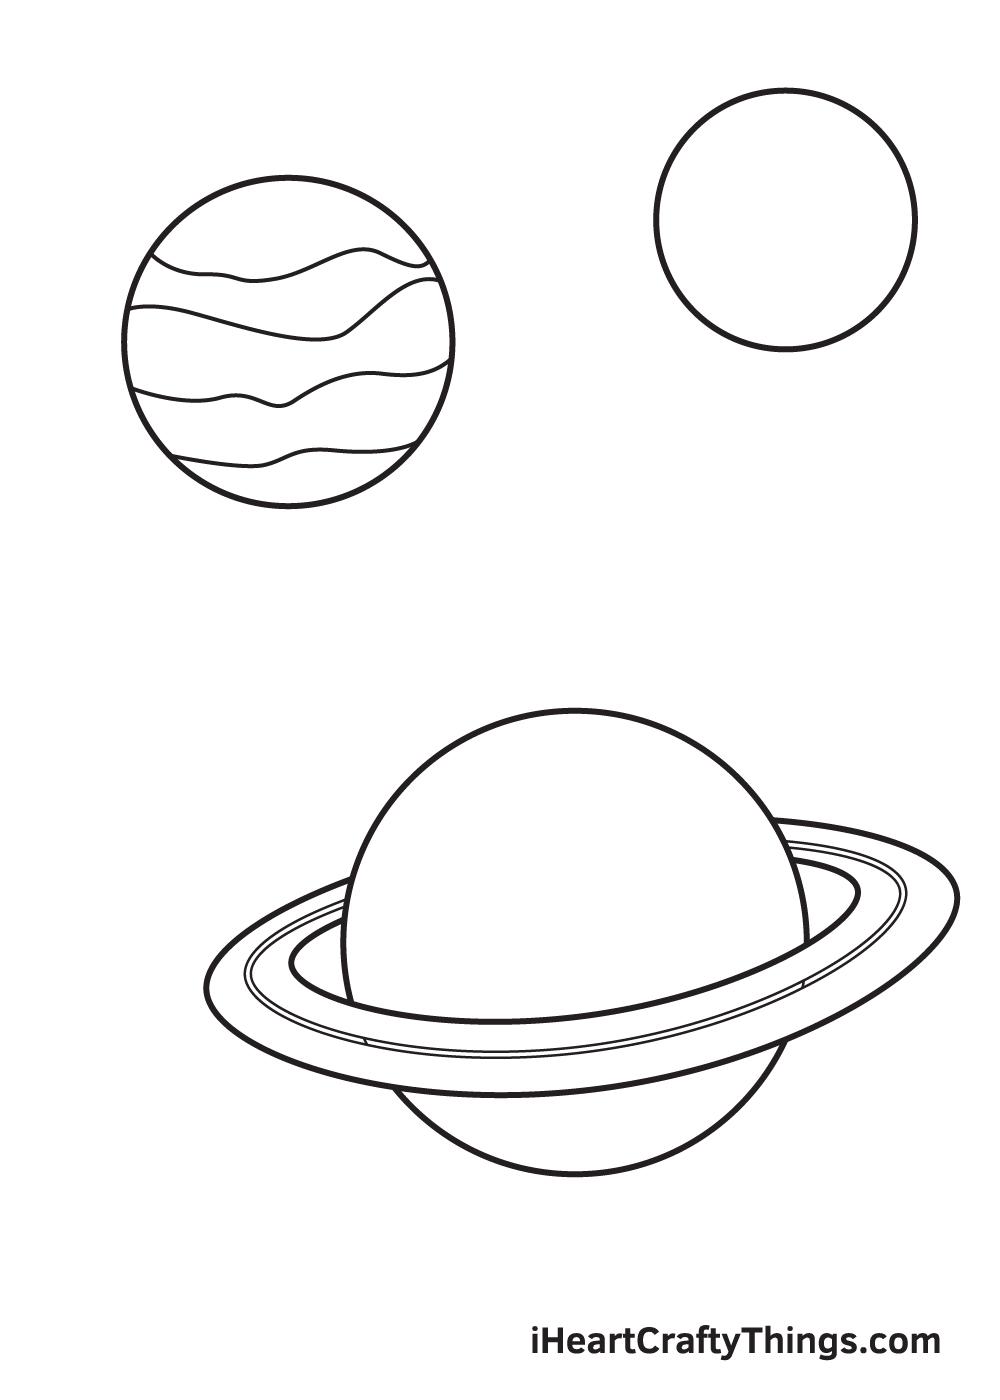 galaxy drawing - step 5